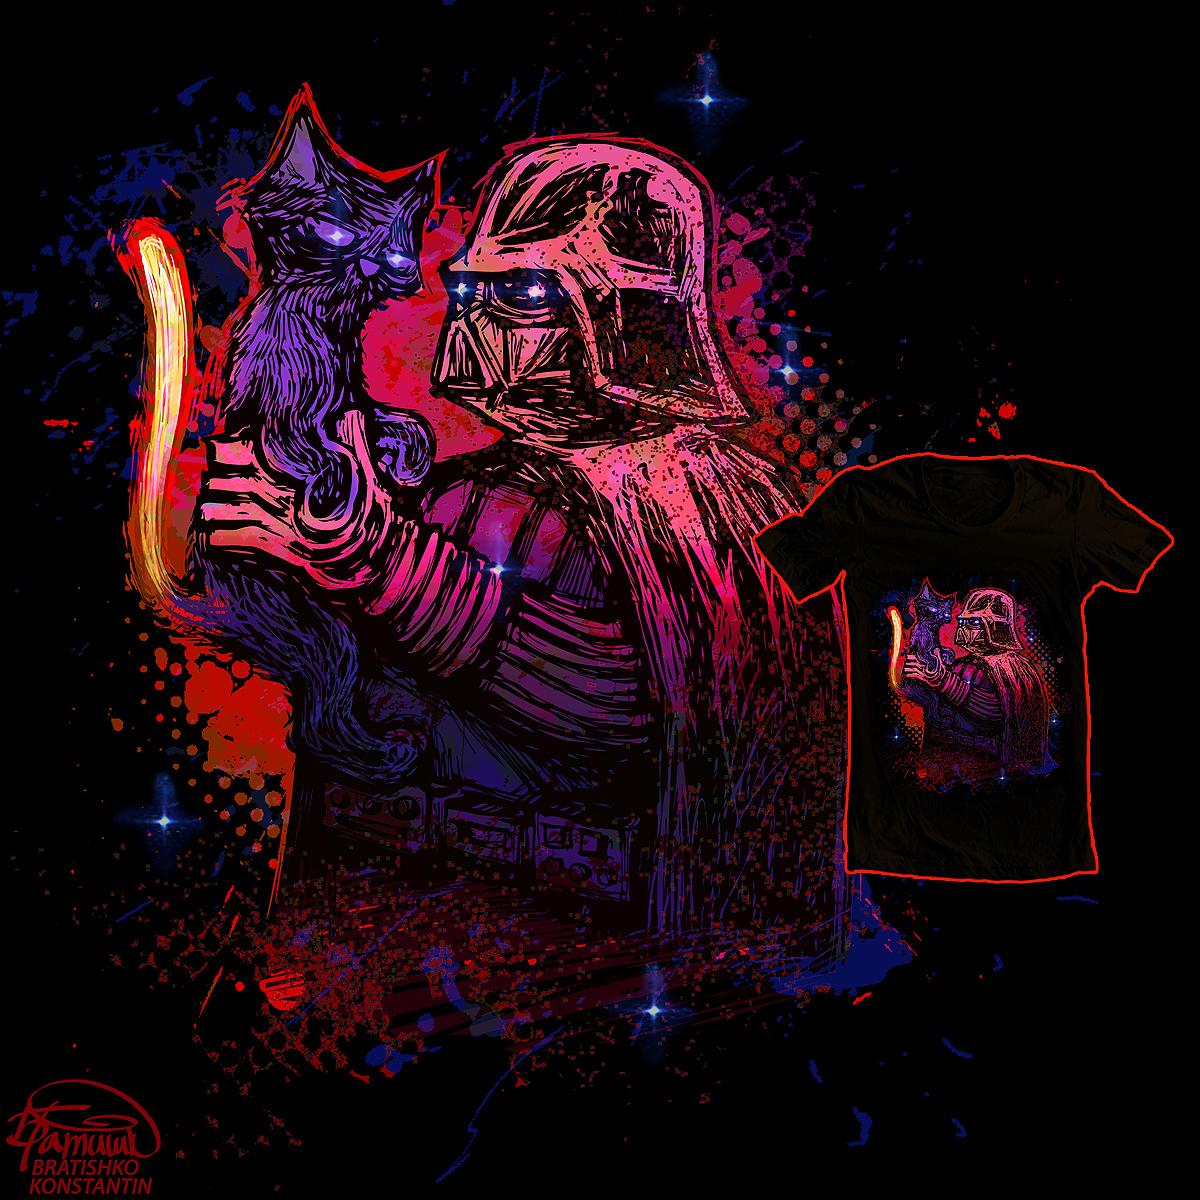 Cat Vader  by KONSTANTIN BRATISHKO on Threadless